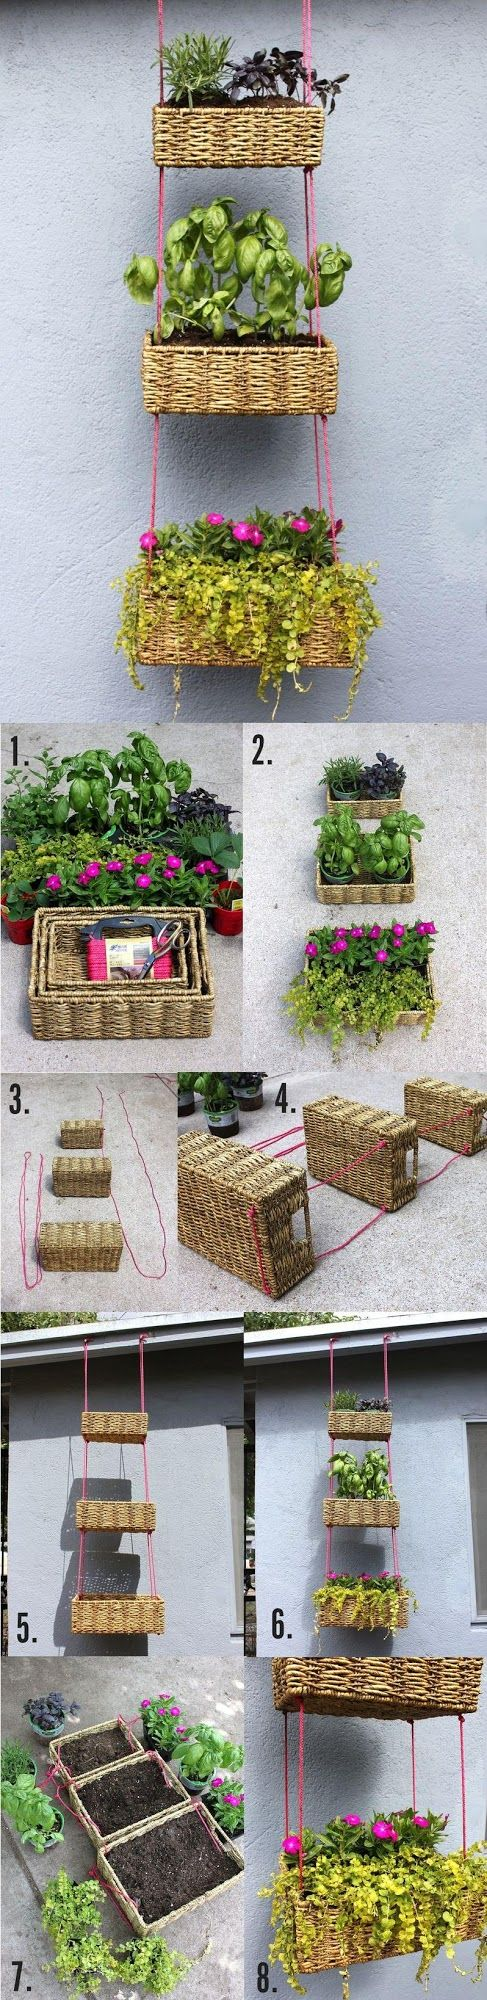 Easy DIY hanging baskets